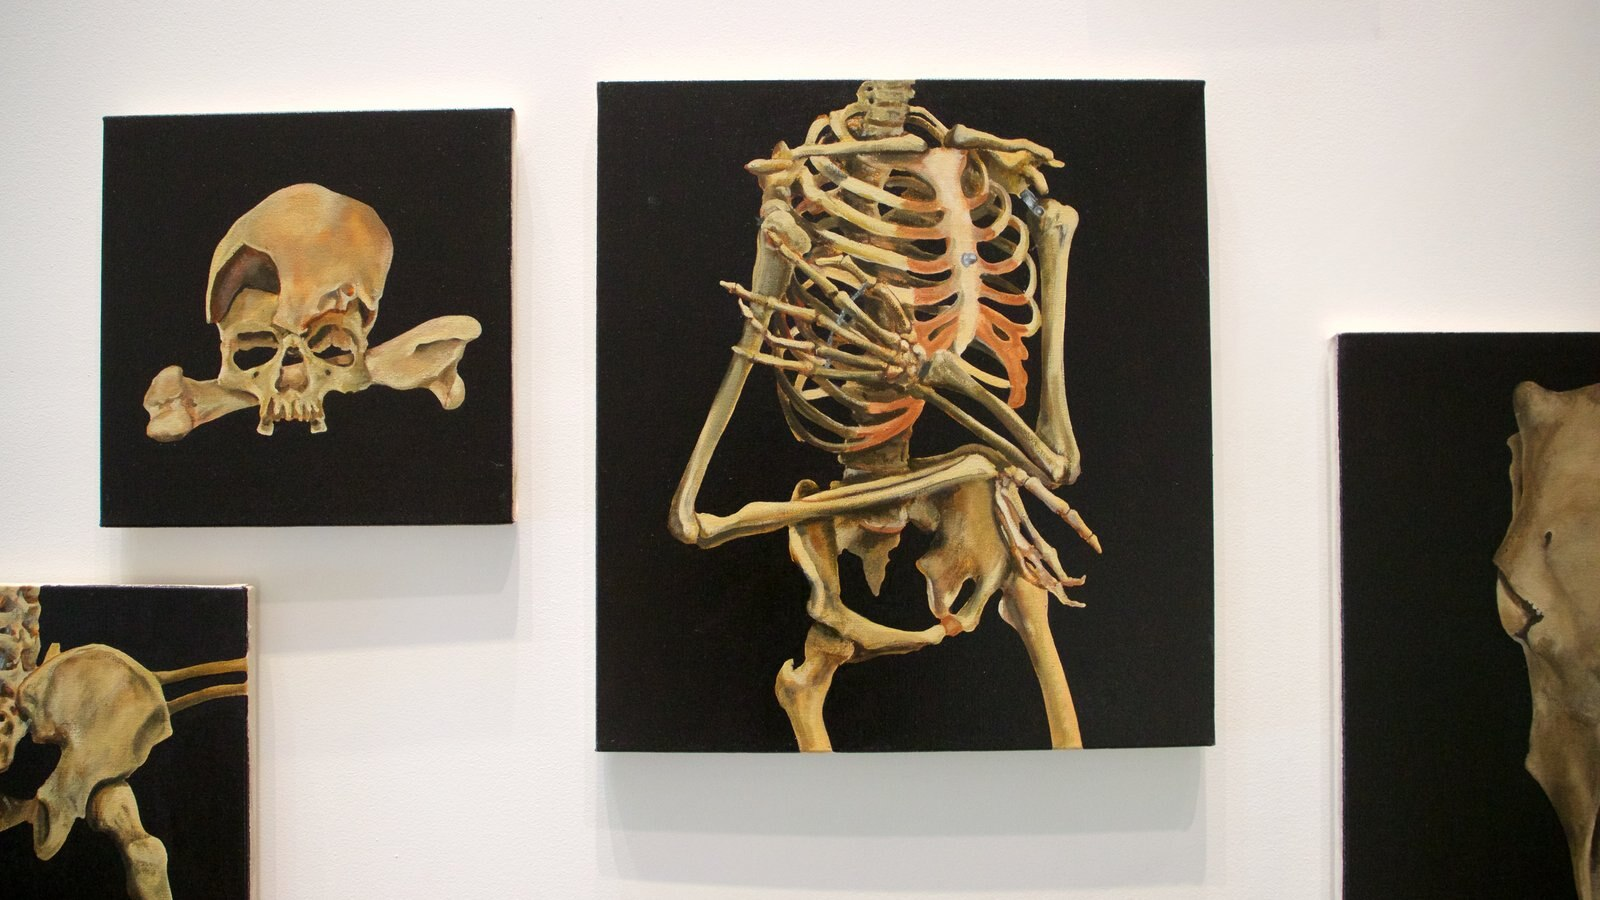 Museo de arte Ian Potter ofreciendo arte